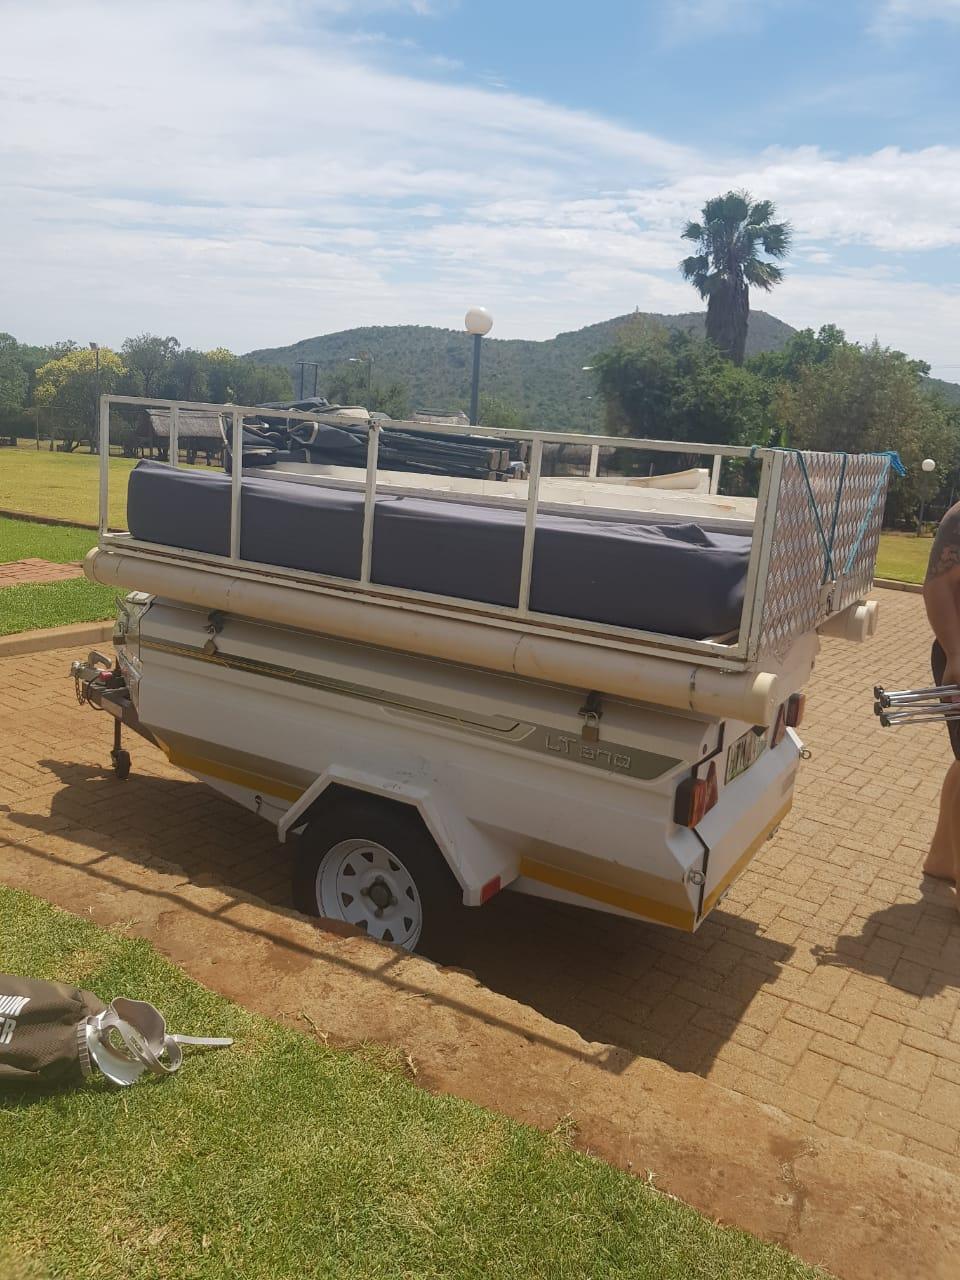 Jurgens LT 670 trailer for sale or swop